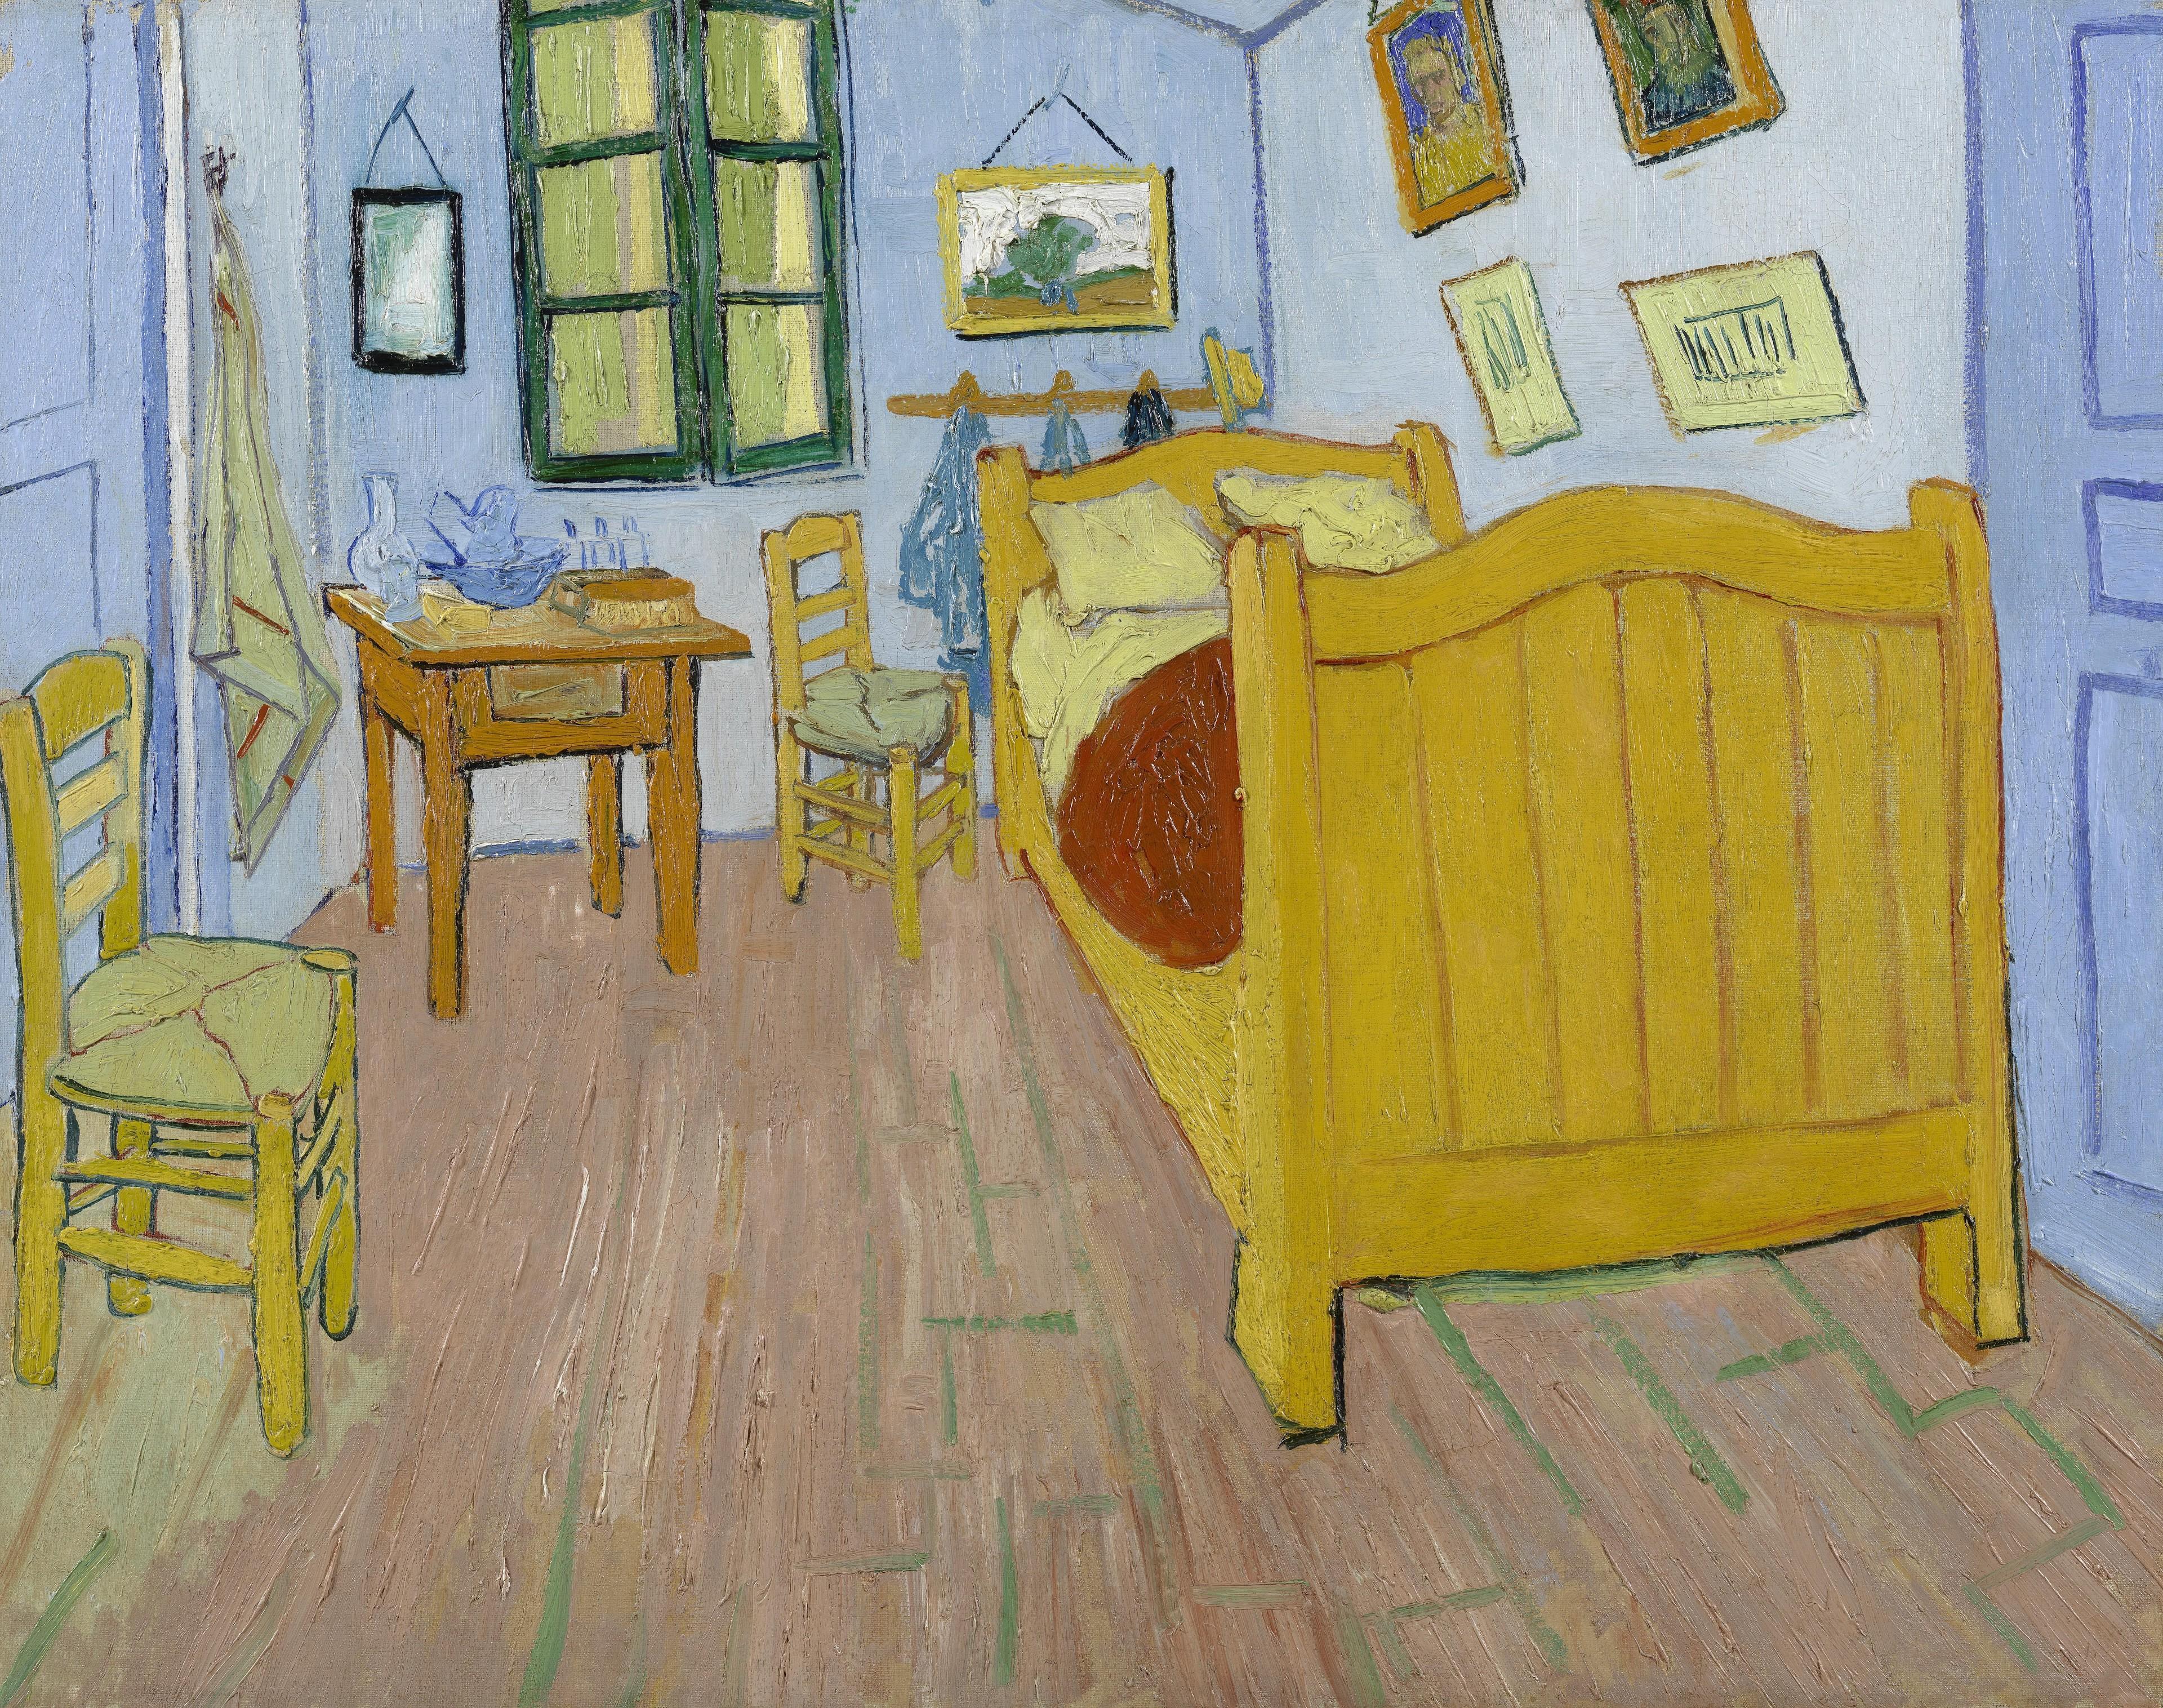 Vincent van Gogh, The Bedroom, 1888.